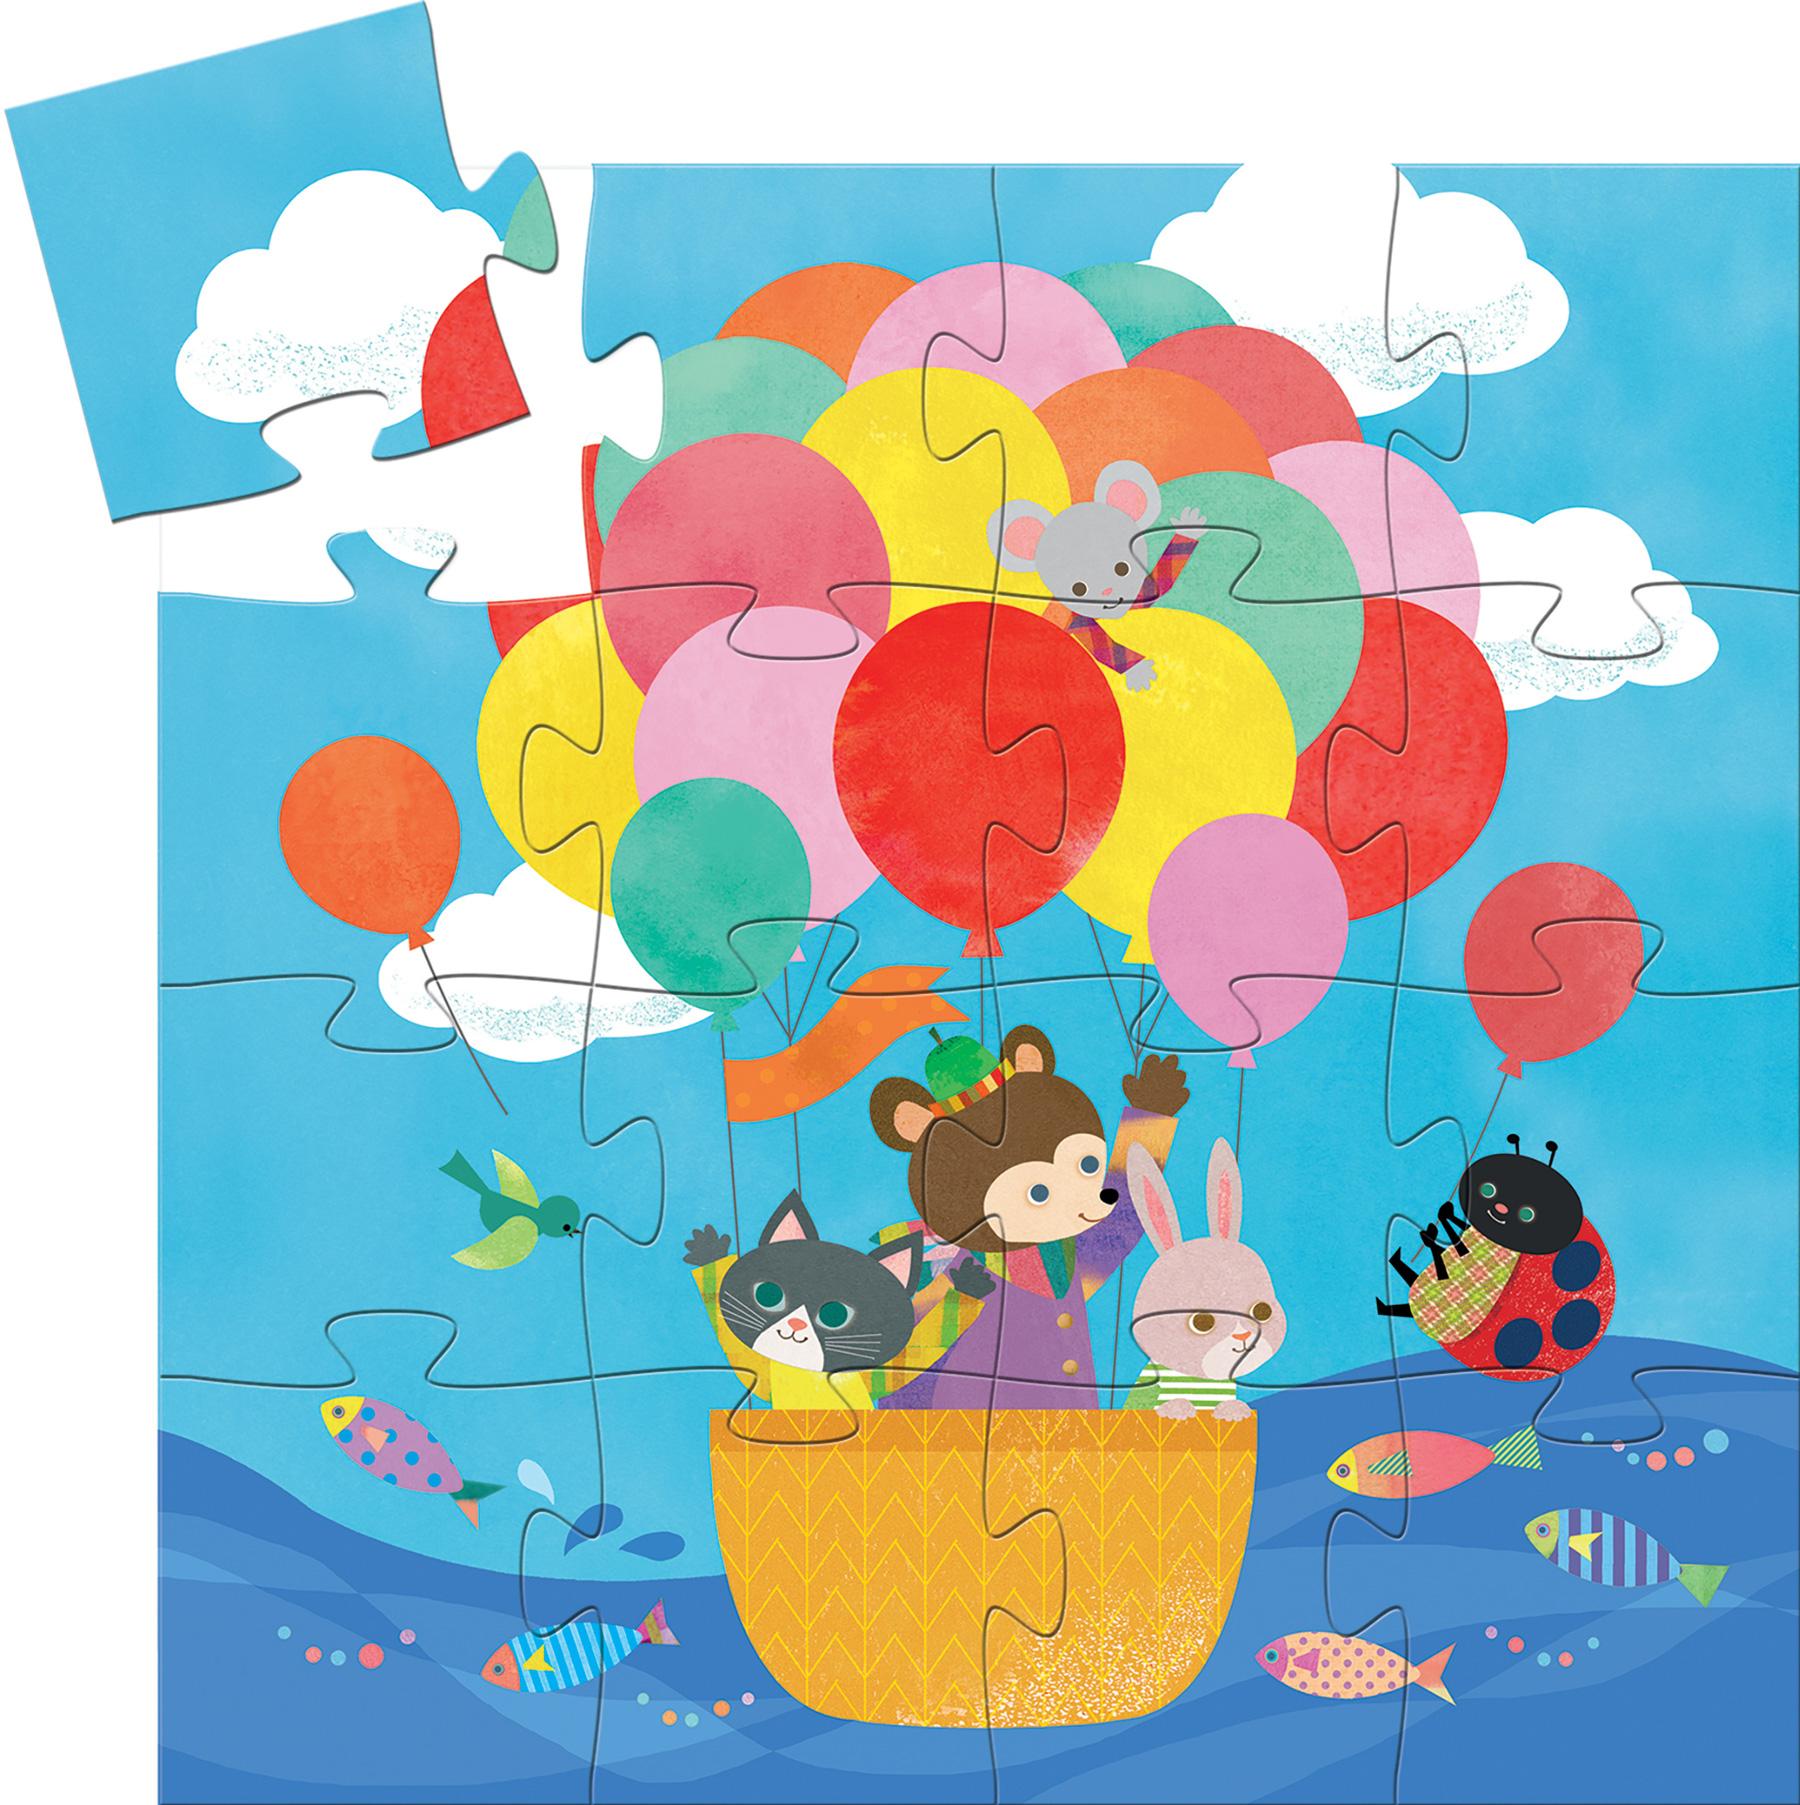 The Hot Air Balloon Balloons Jigsaw Puzzle